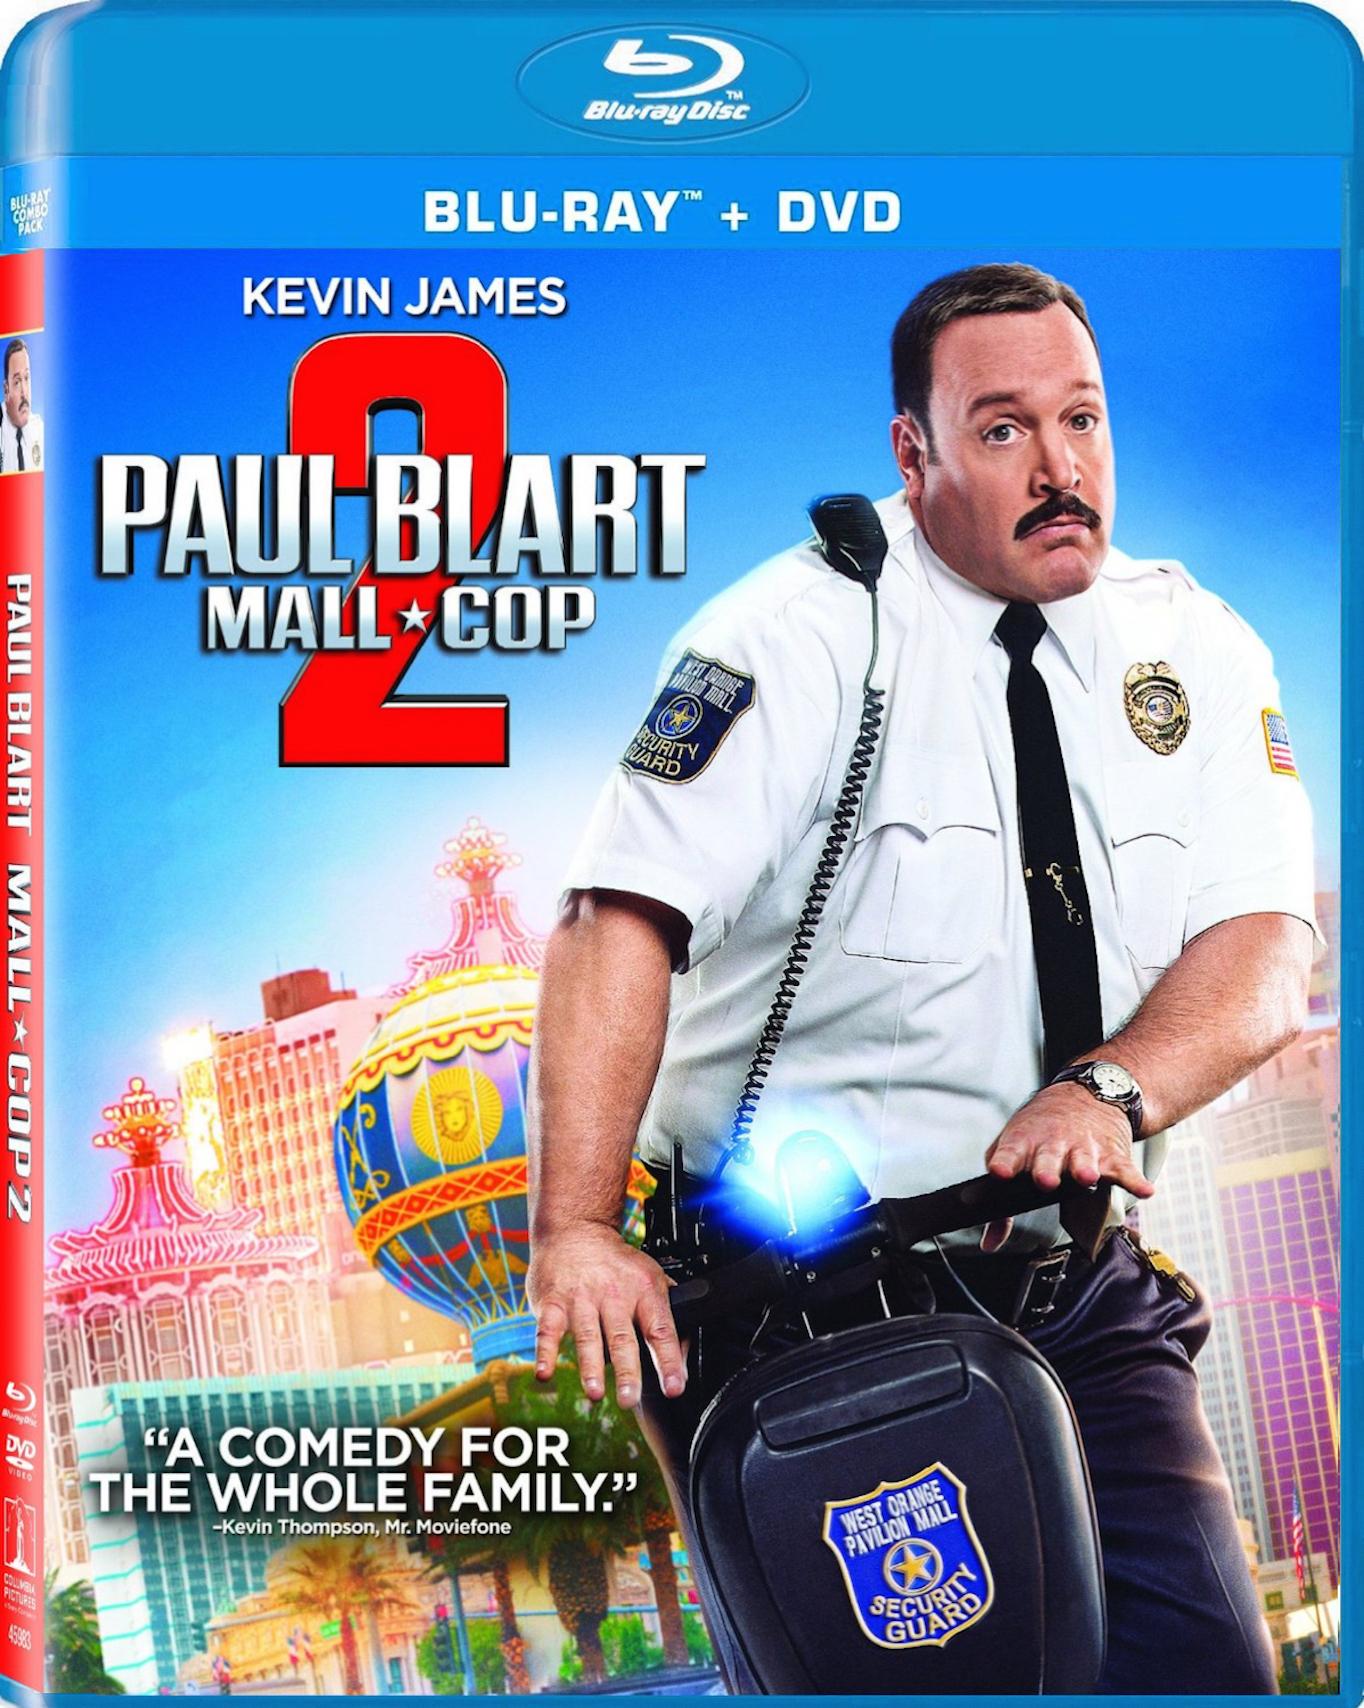 paul blart mall cop 2 blu ray